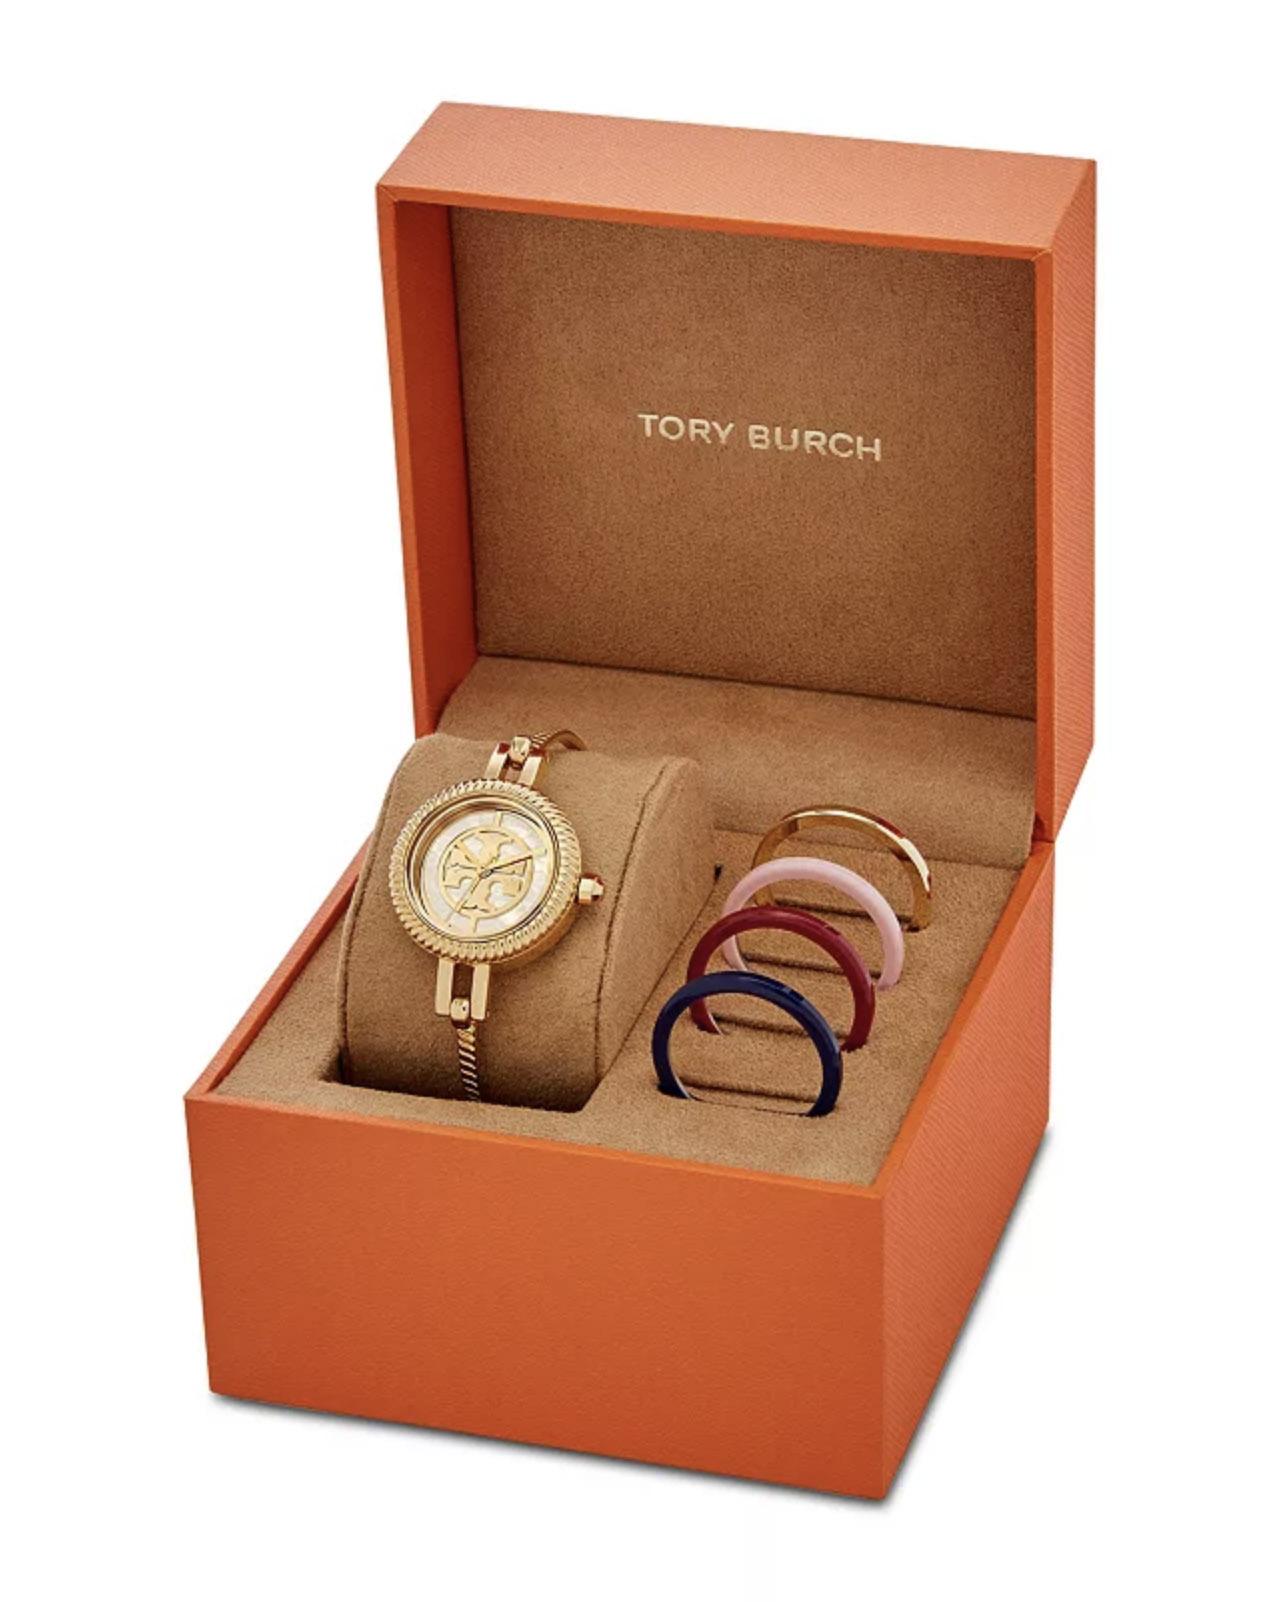 Tory Burch The Reva Bangle Bracelet Watch Gift Set